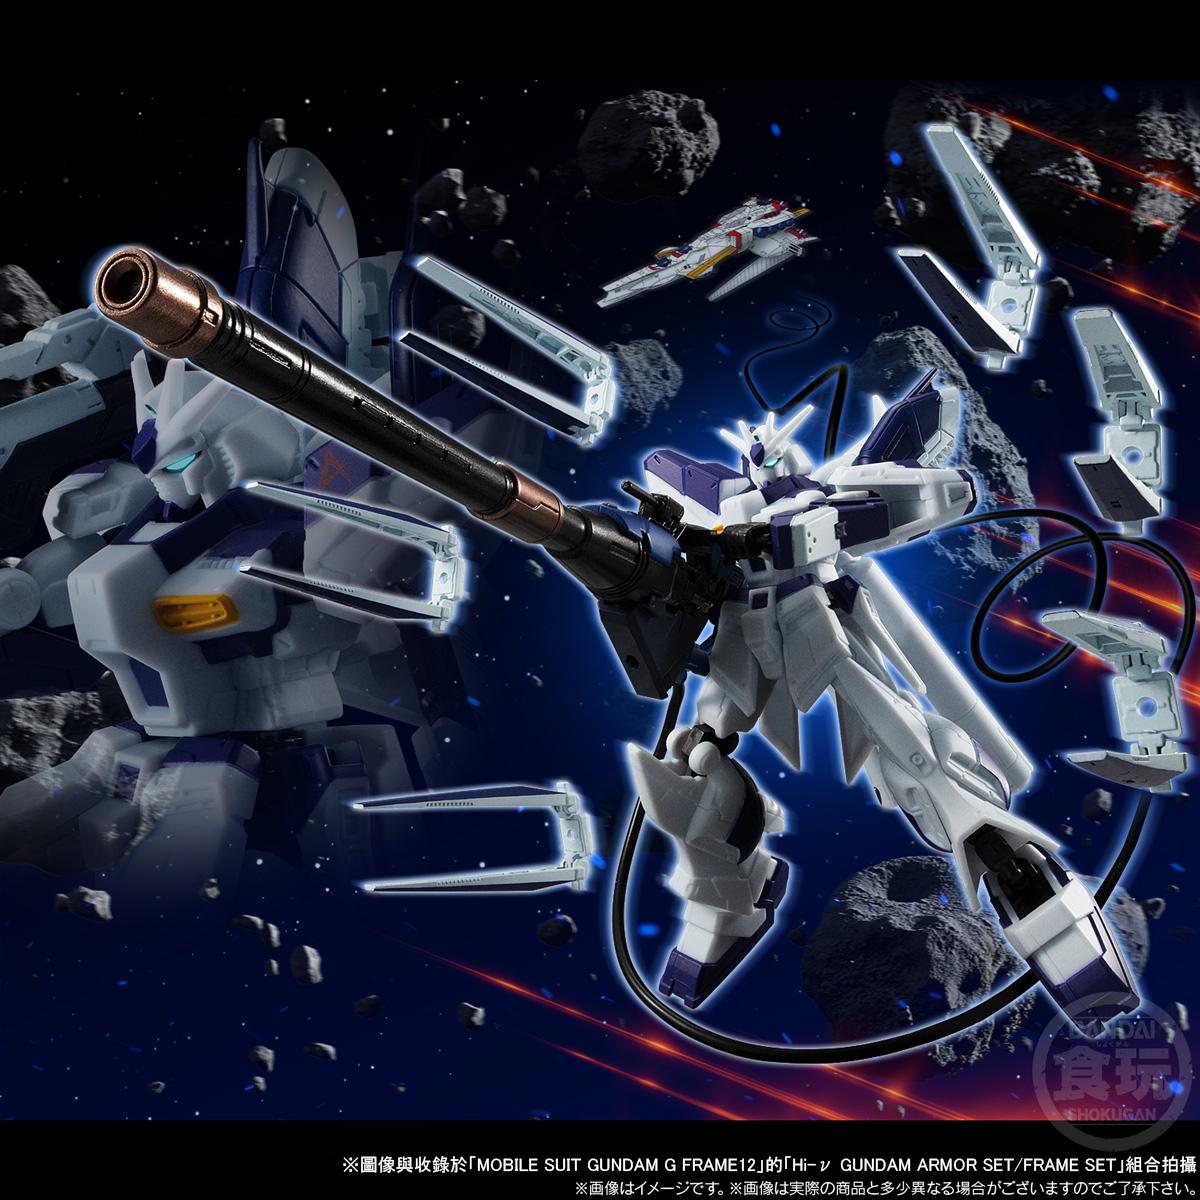 MOBILE SUIT GUNDAM G-FRAME Hi- ν GUNDAM OPTION PARTS SET W/O GUM